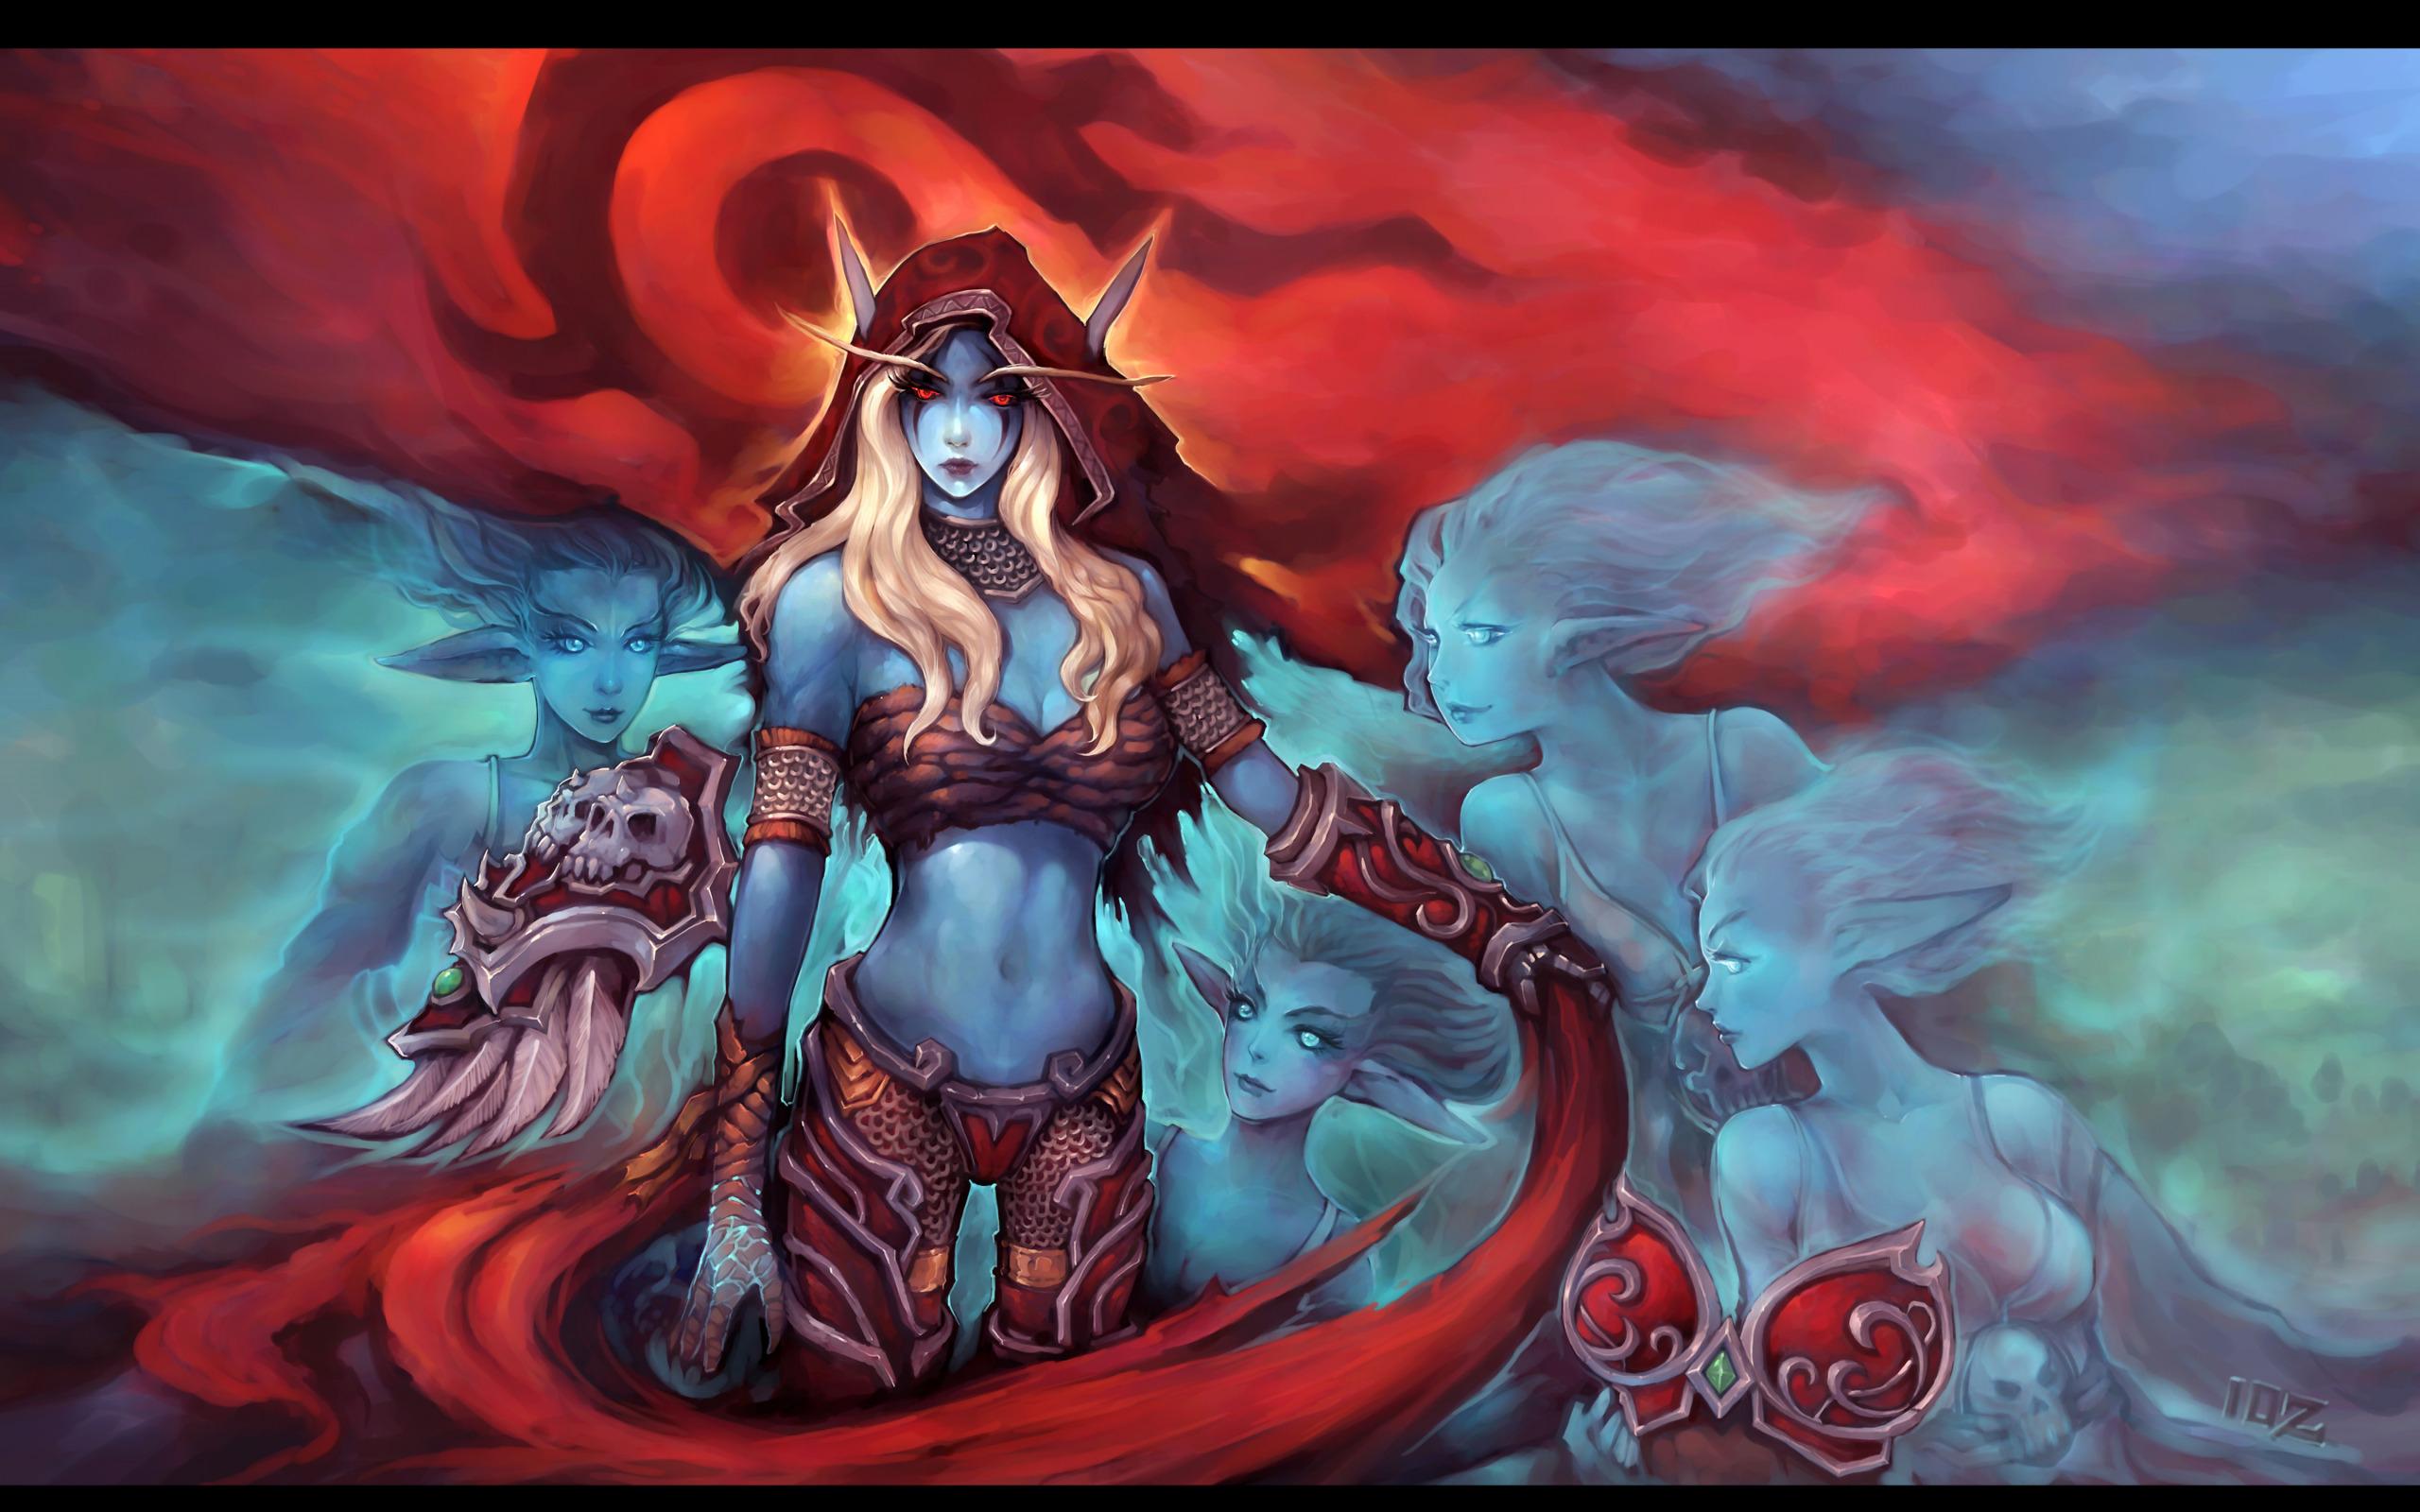 Warcraft sylvanus hentai adult scenes